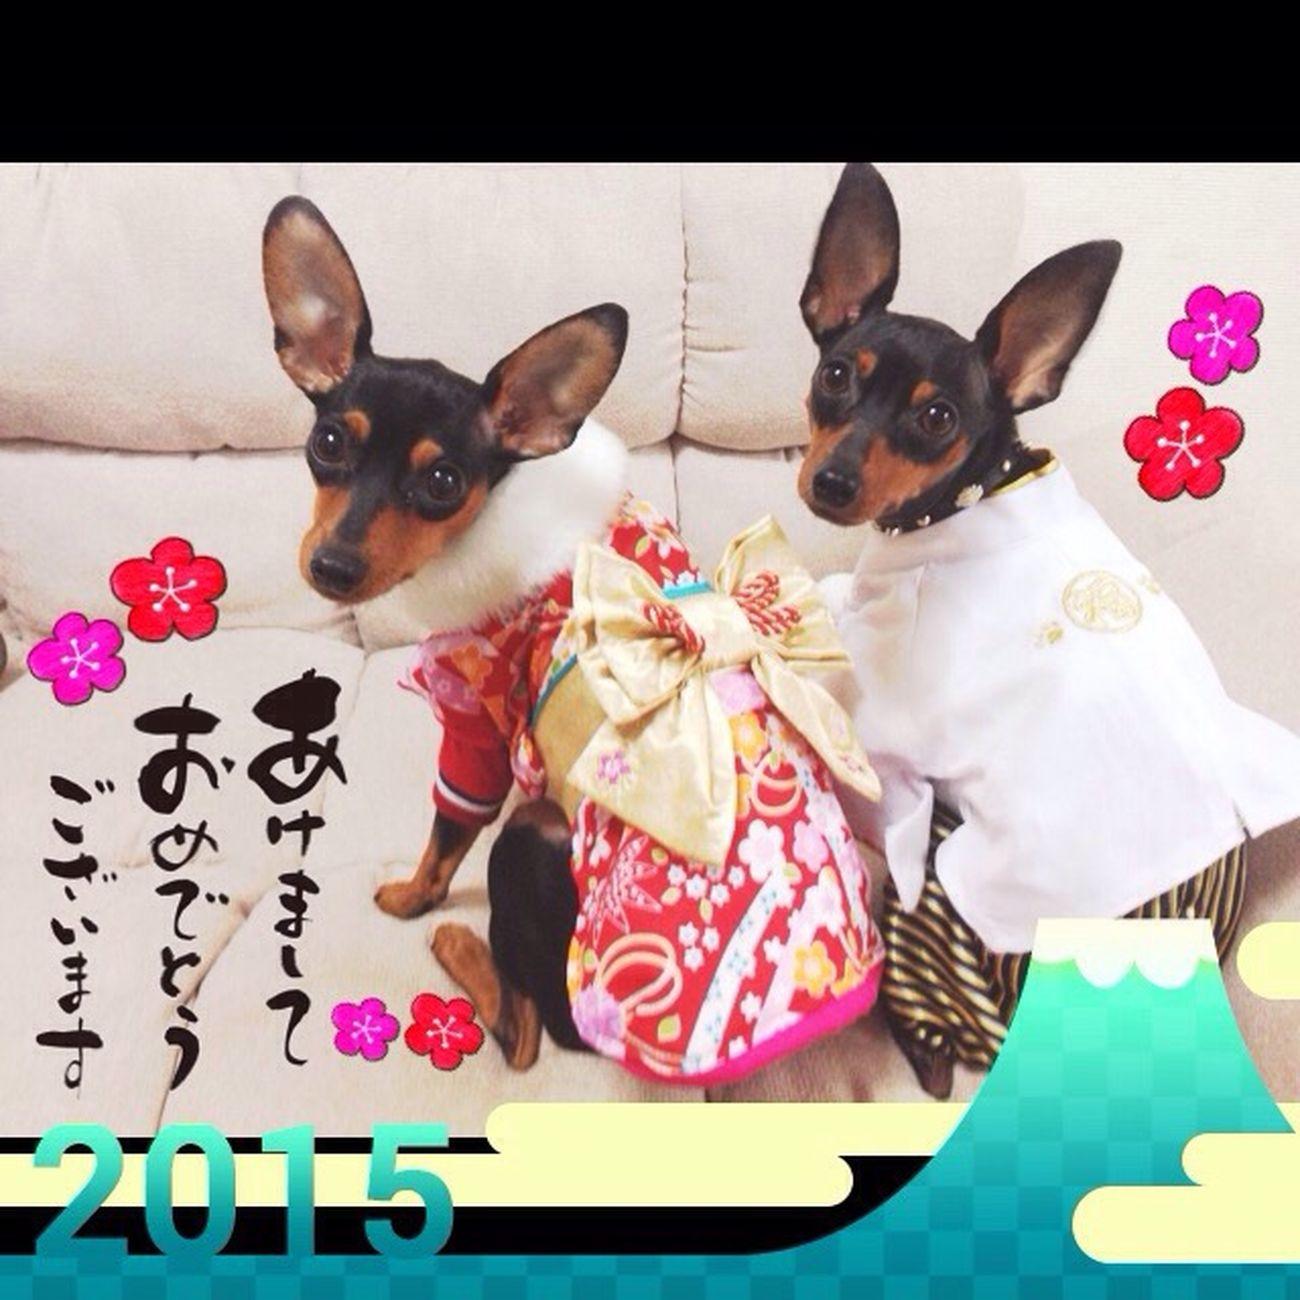 Happy New Year Minipincher Hello World I Love My Dog